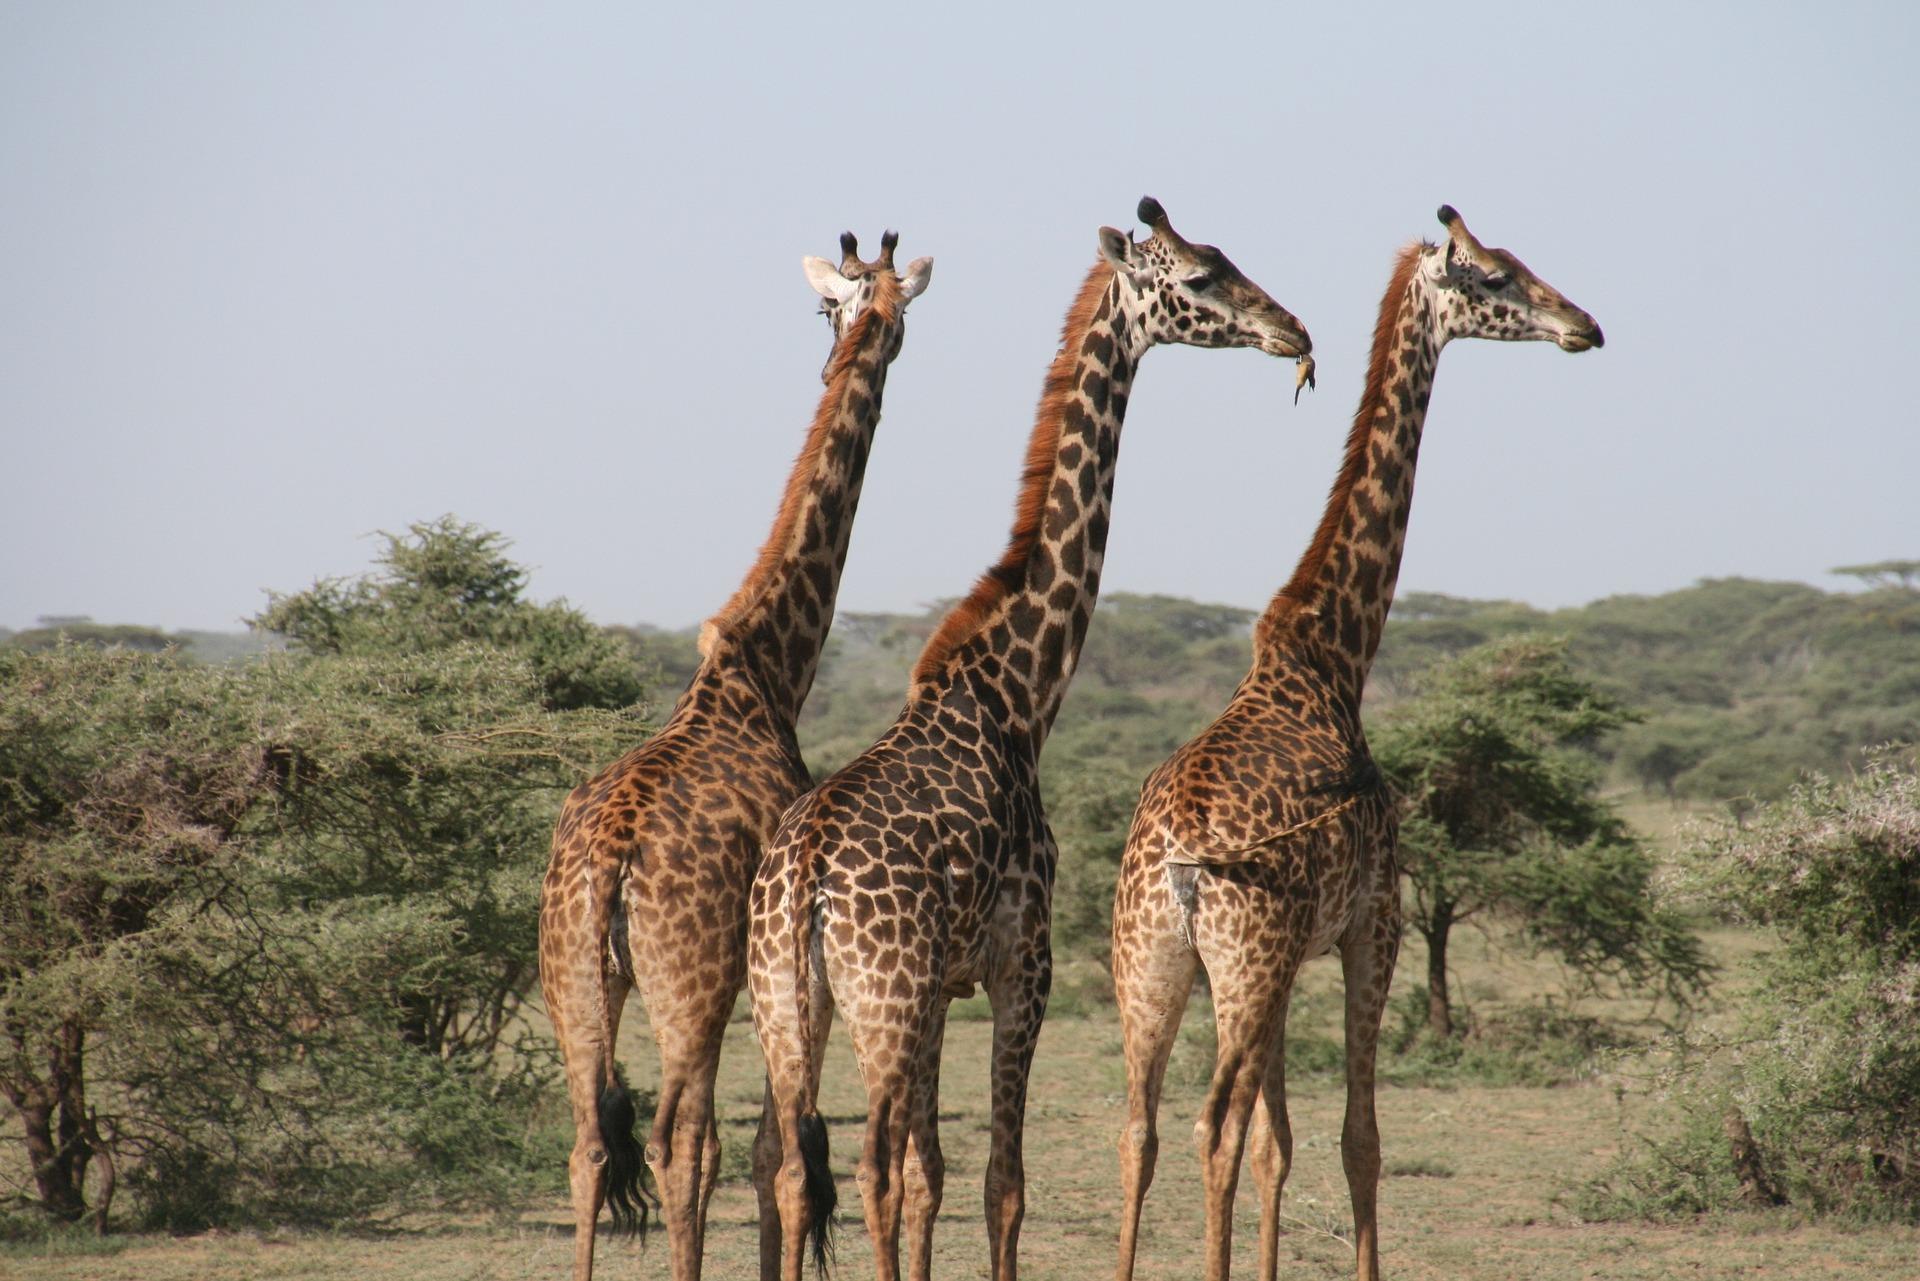 Séjour en Tanzanie-Girafes dans le Serengeti